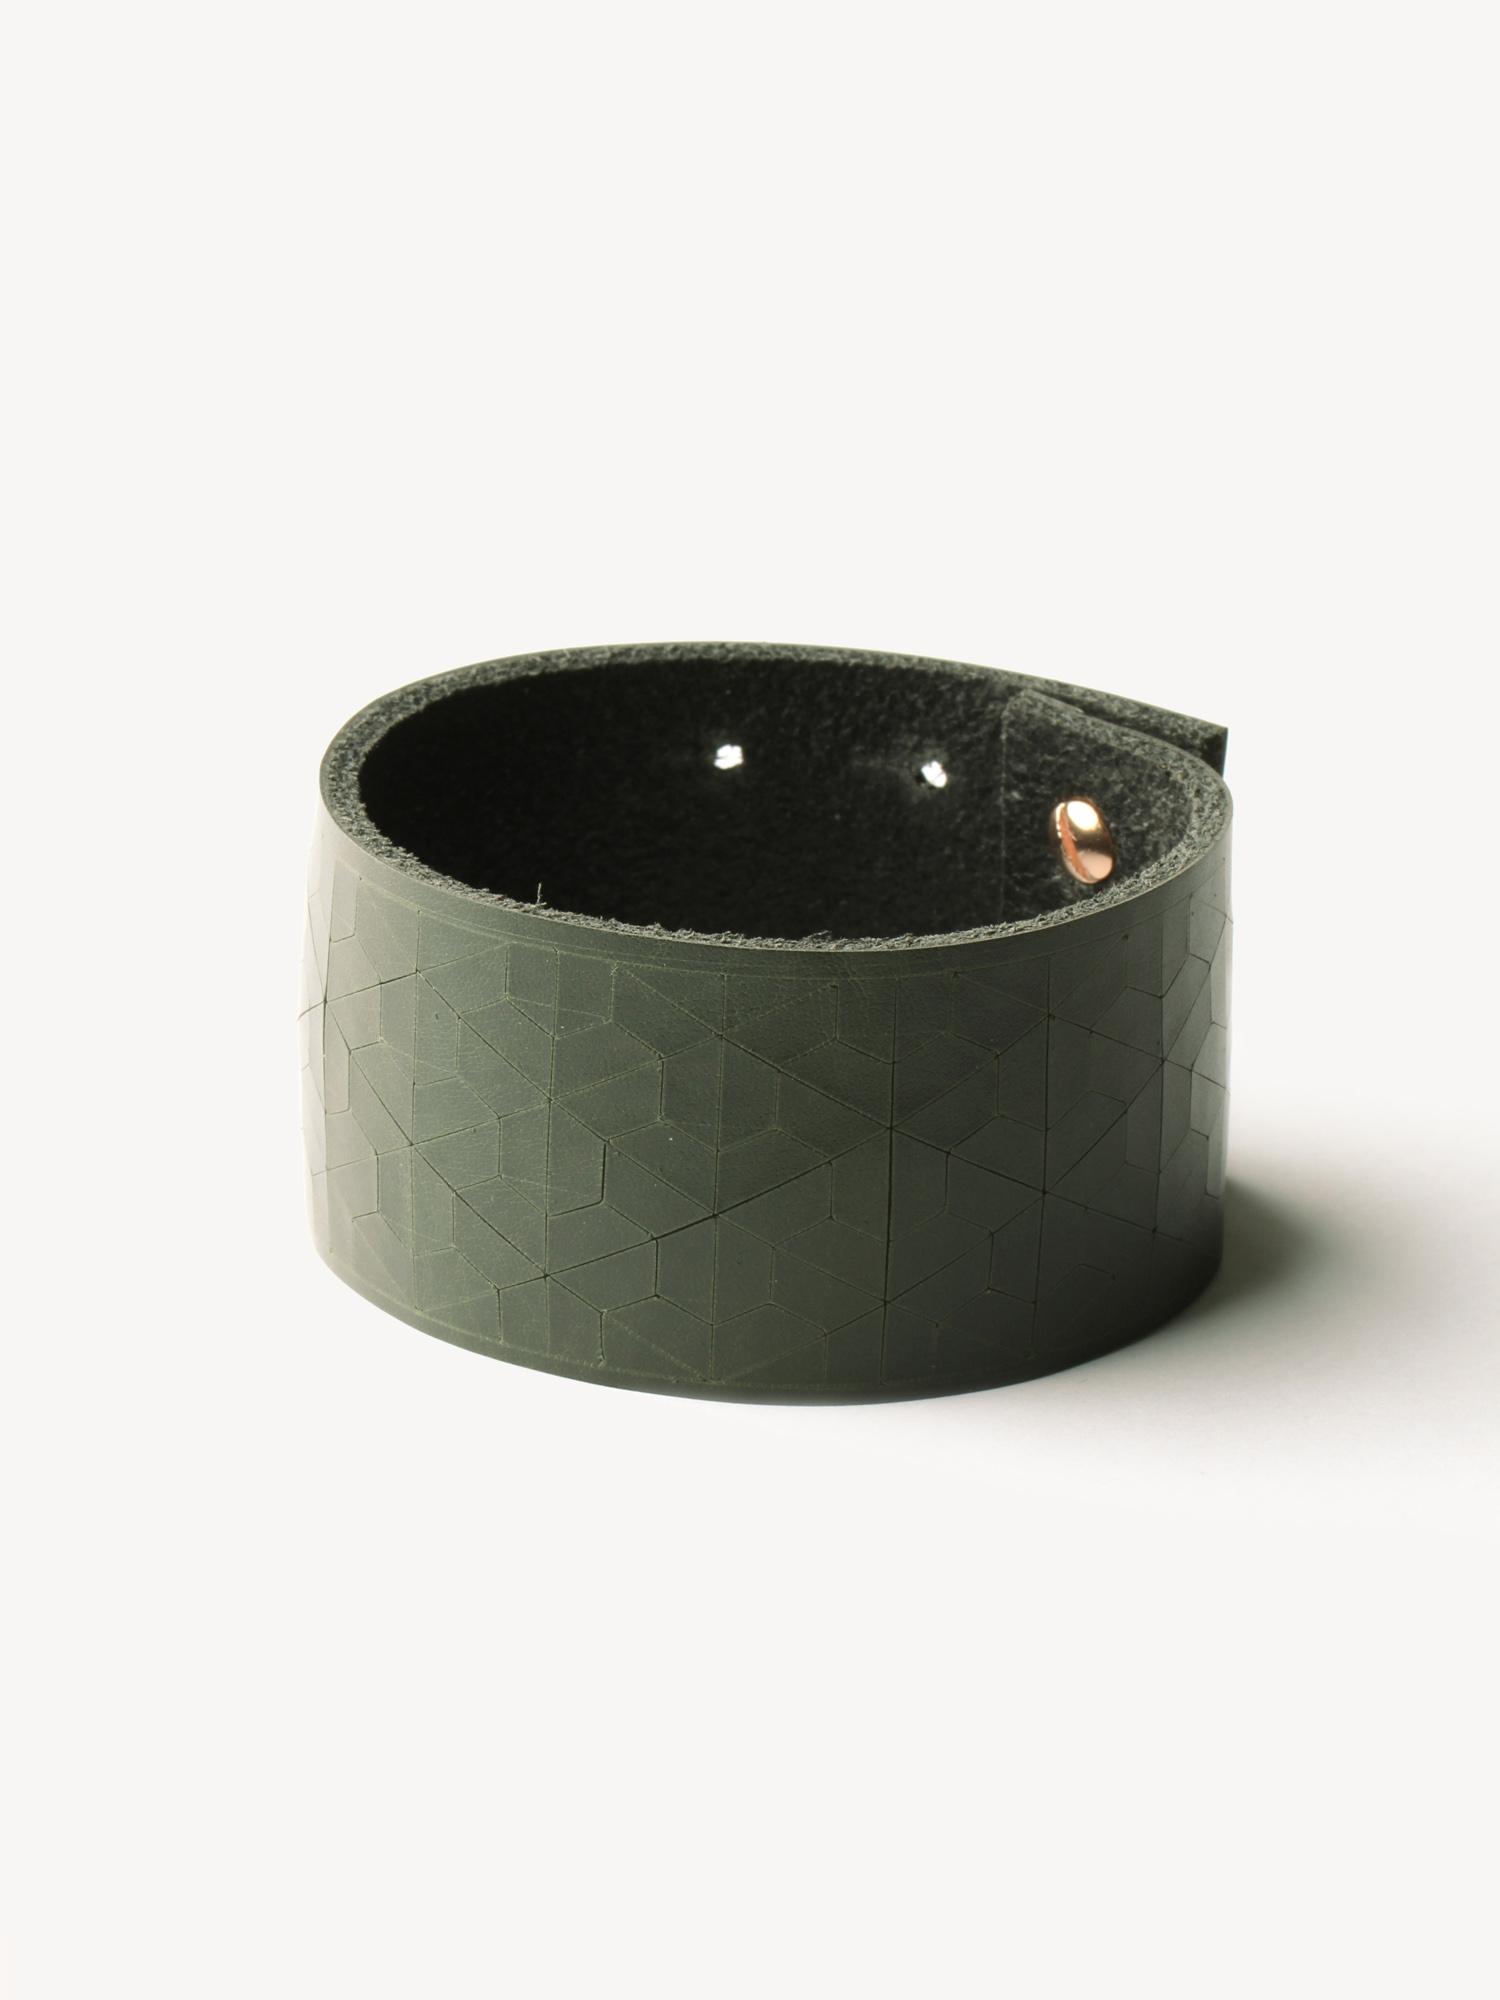 Leder-Armband, schmal in dunkelgrün  Leather bracelet, big in dark green